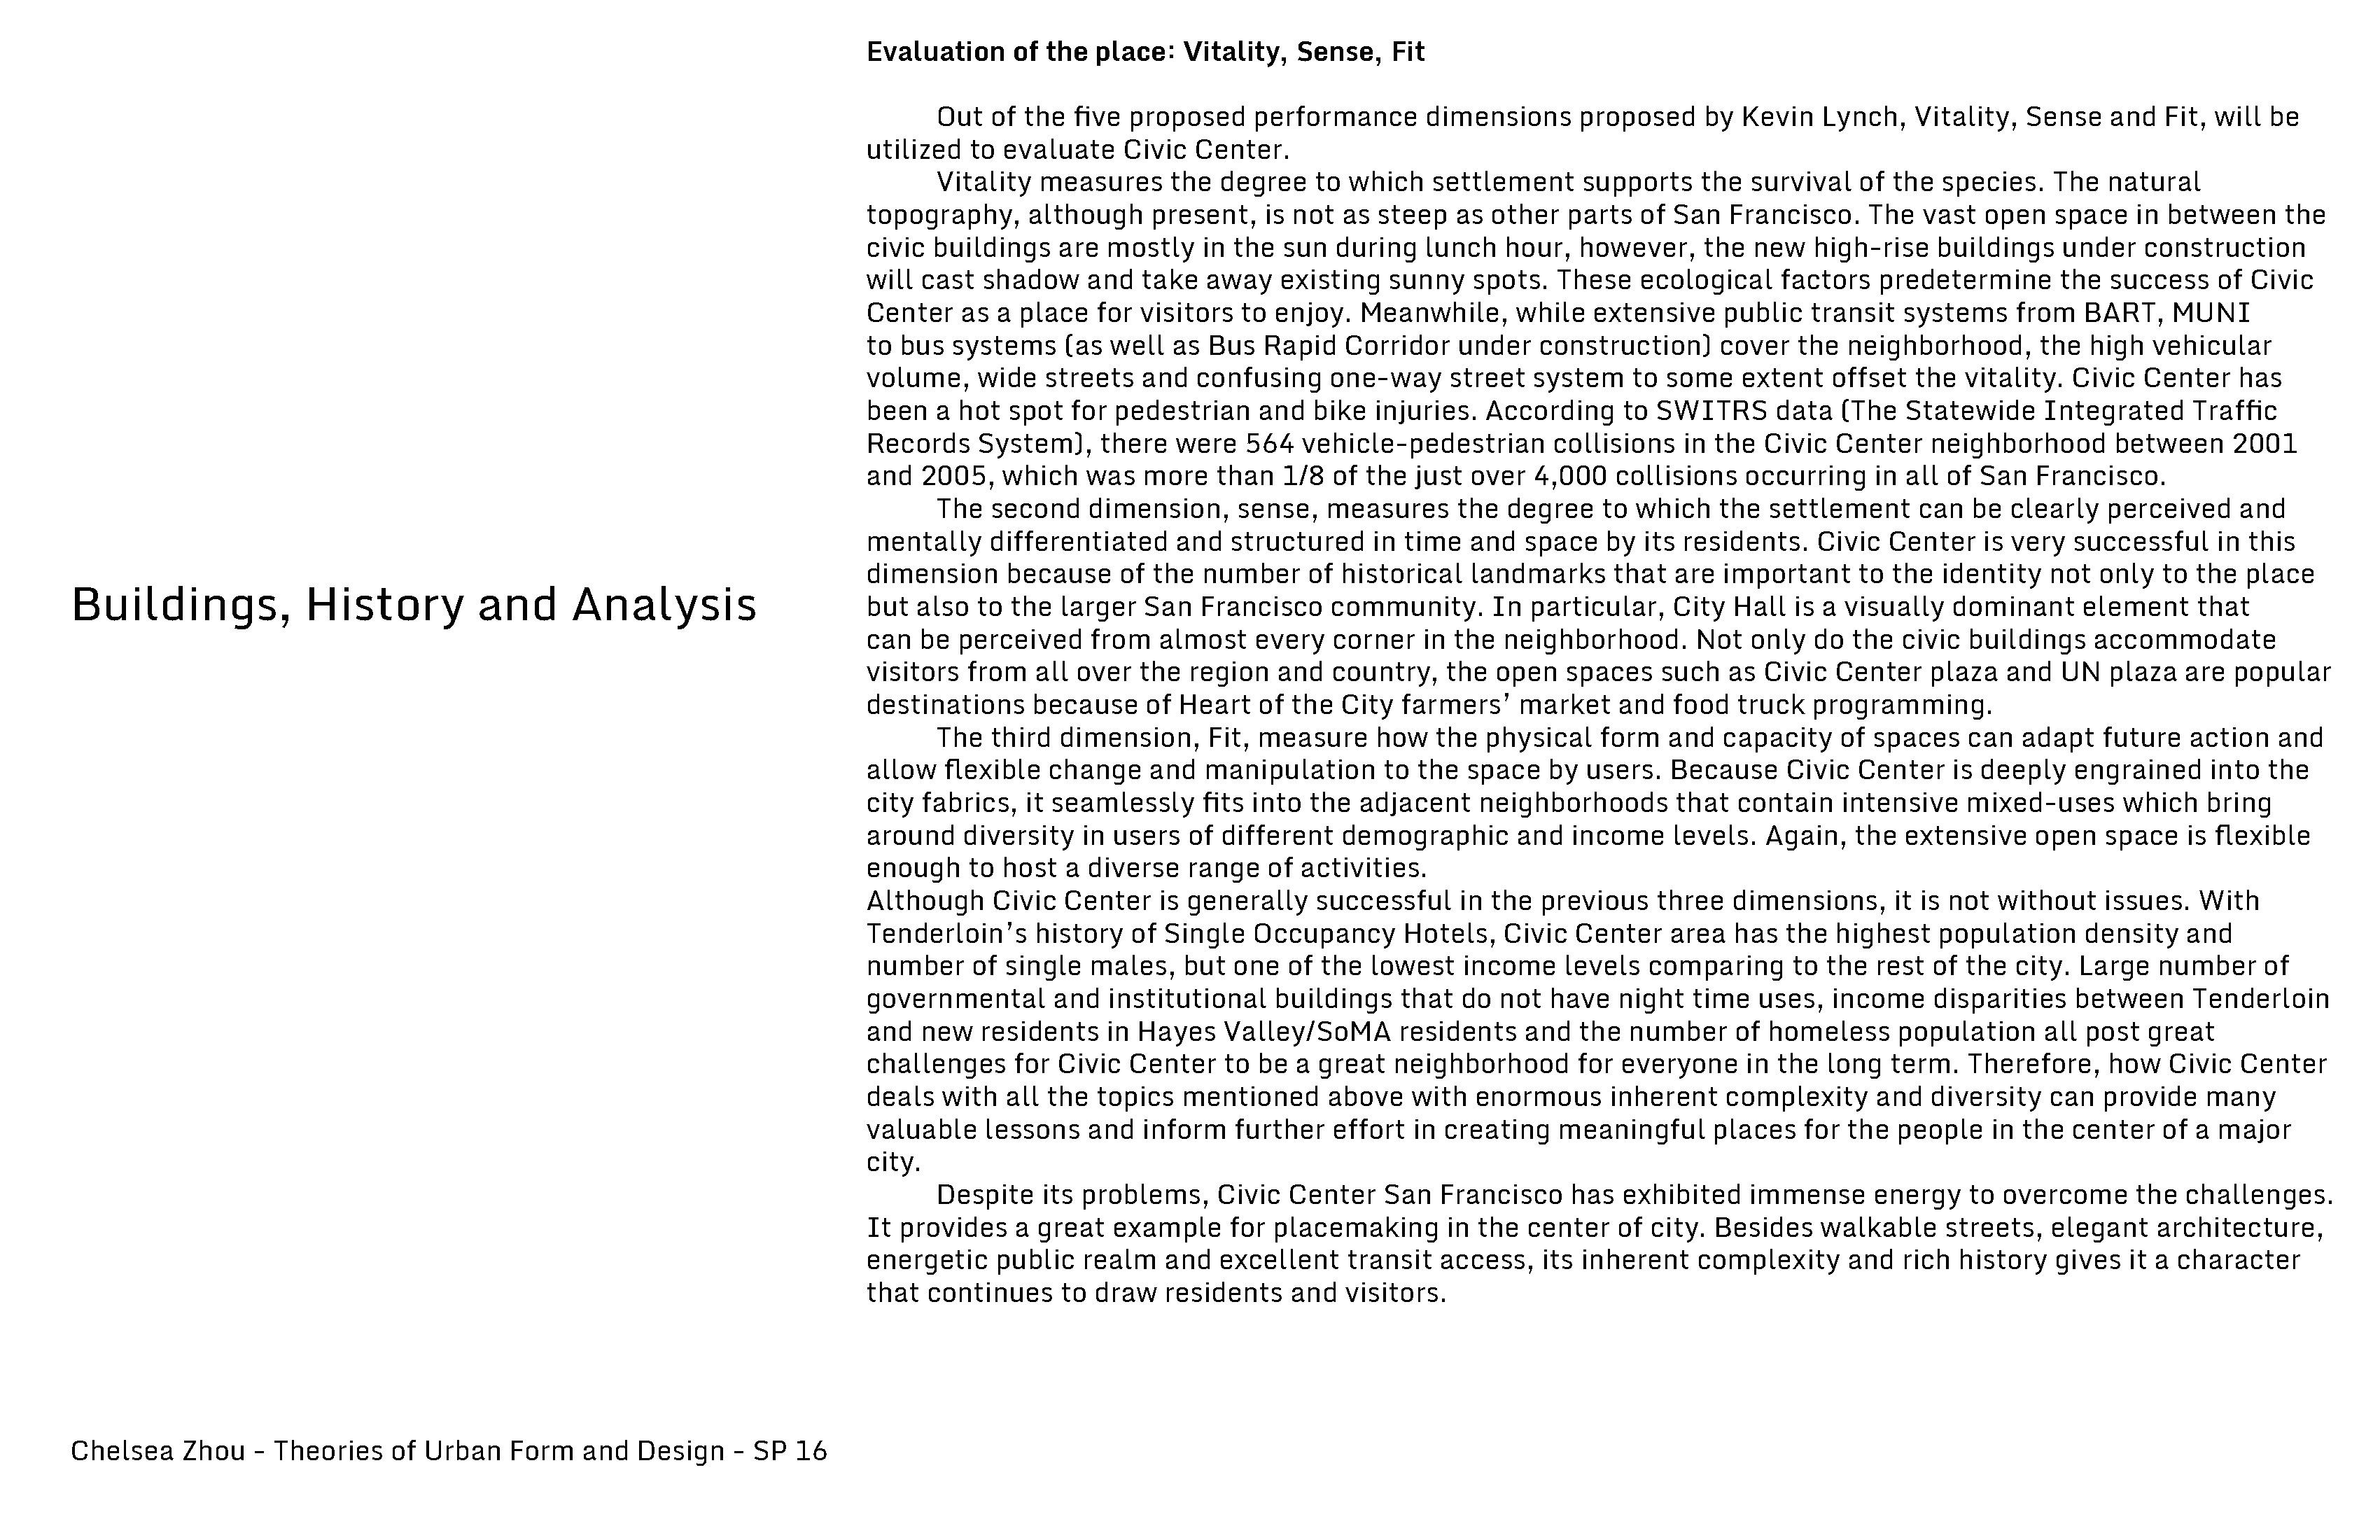 morph analysis cz final_Page_16